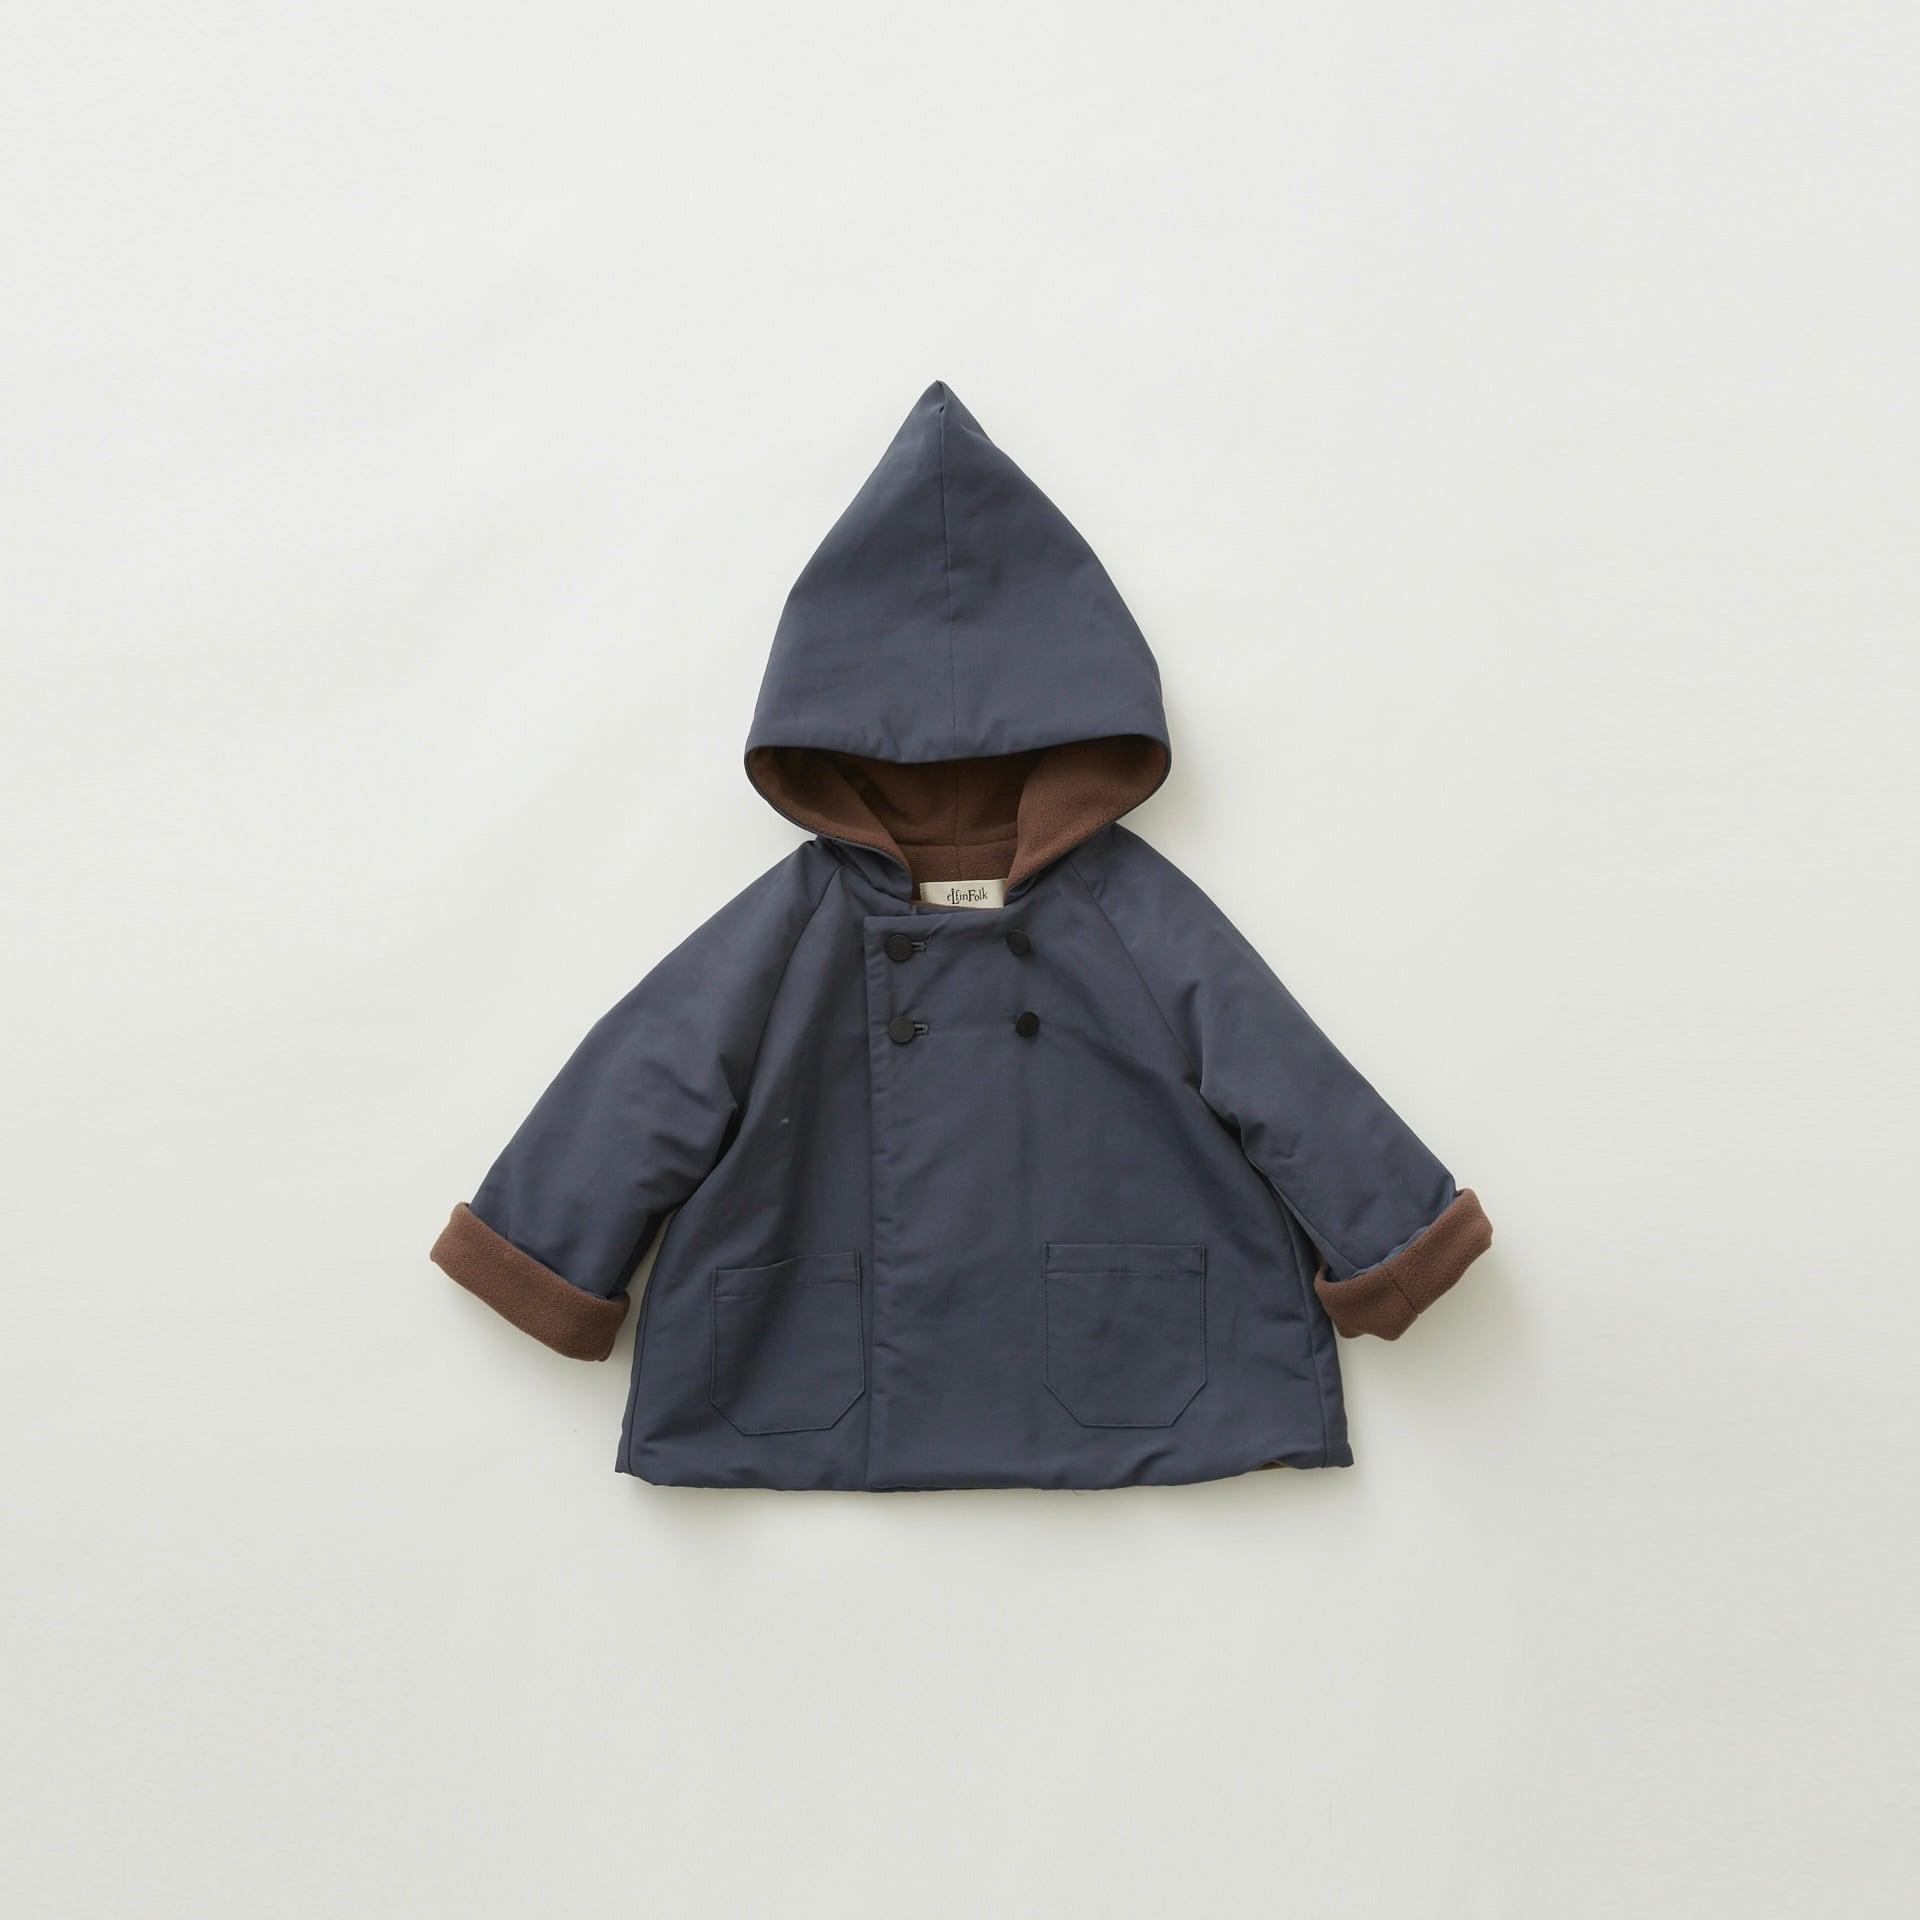 《eLfinFolk 2021AW》elf coat / blue gray / 90-100cm